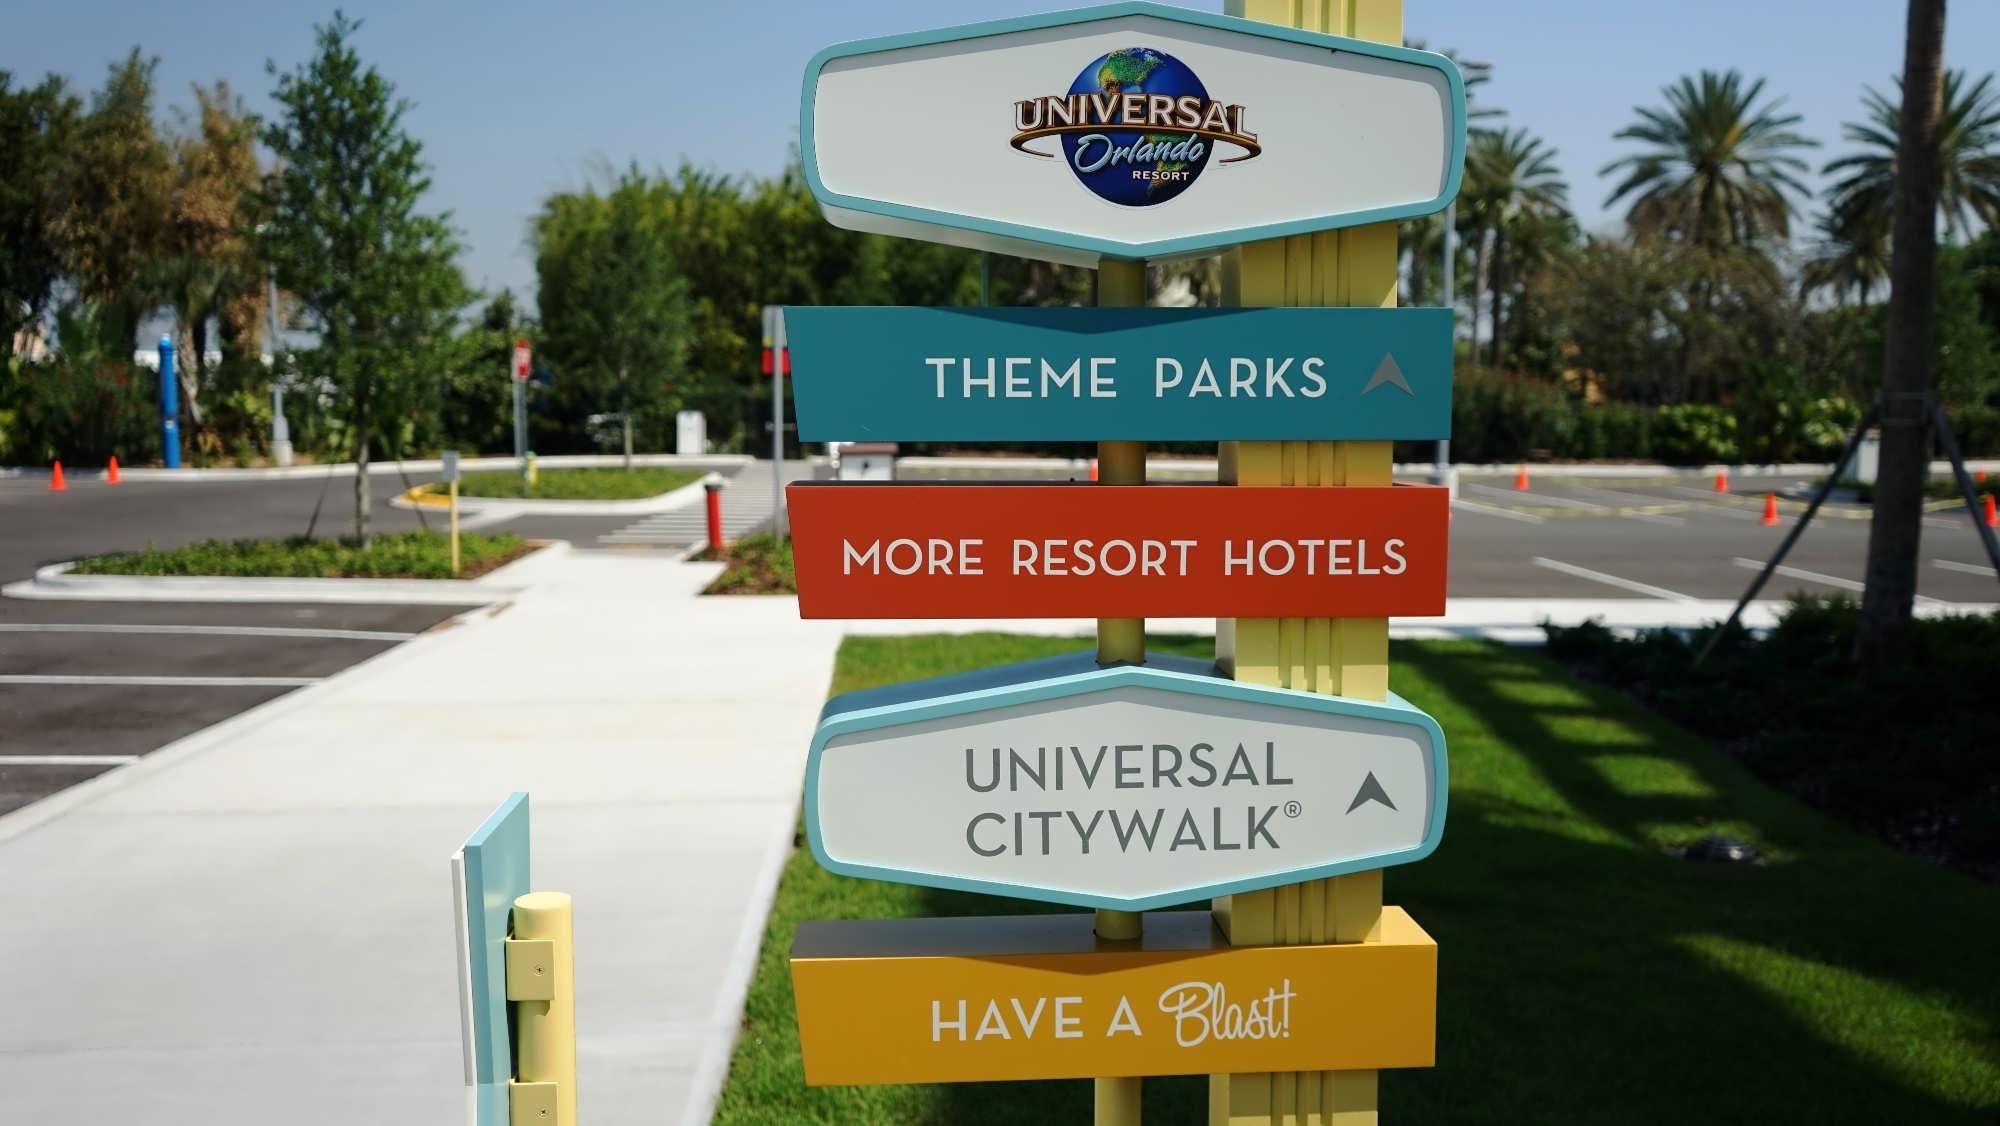 ... the walkway from Cabana Bay Beach Resort to Universal's theme parks